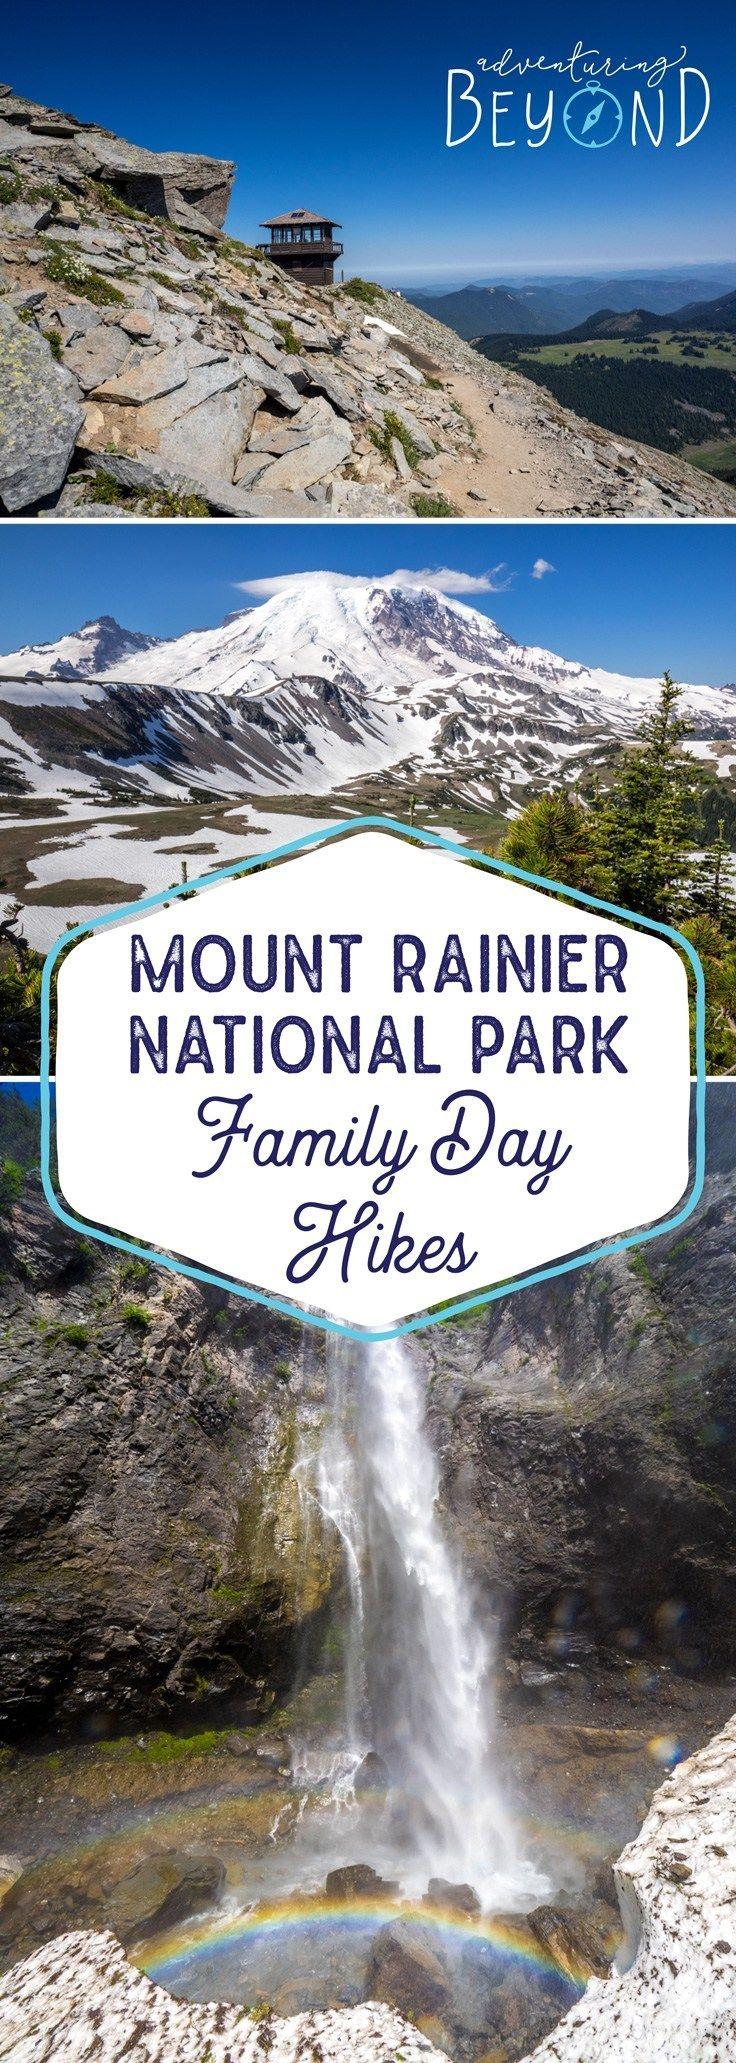 Mount Rainier National Park – Family Day Hikes